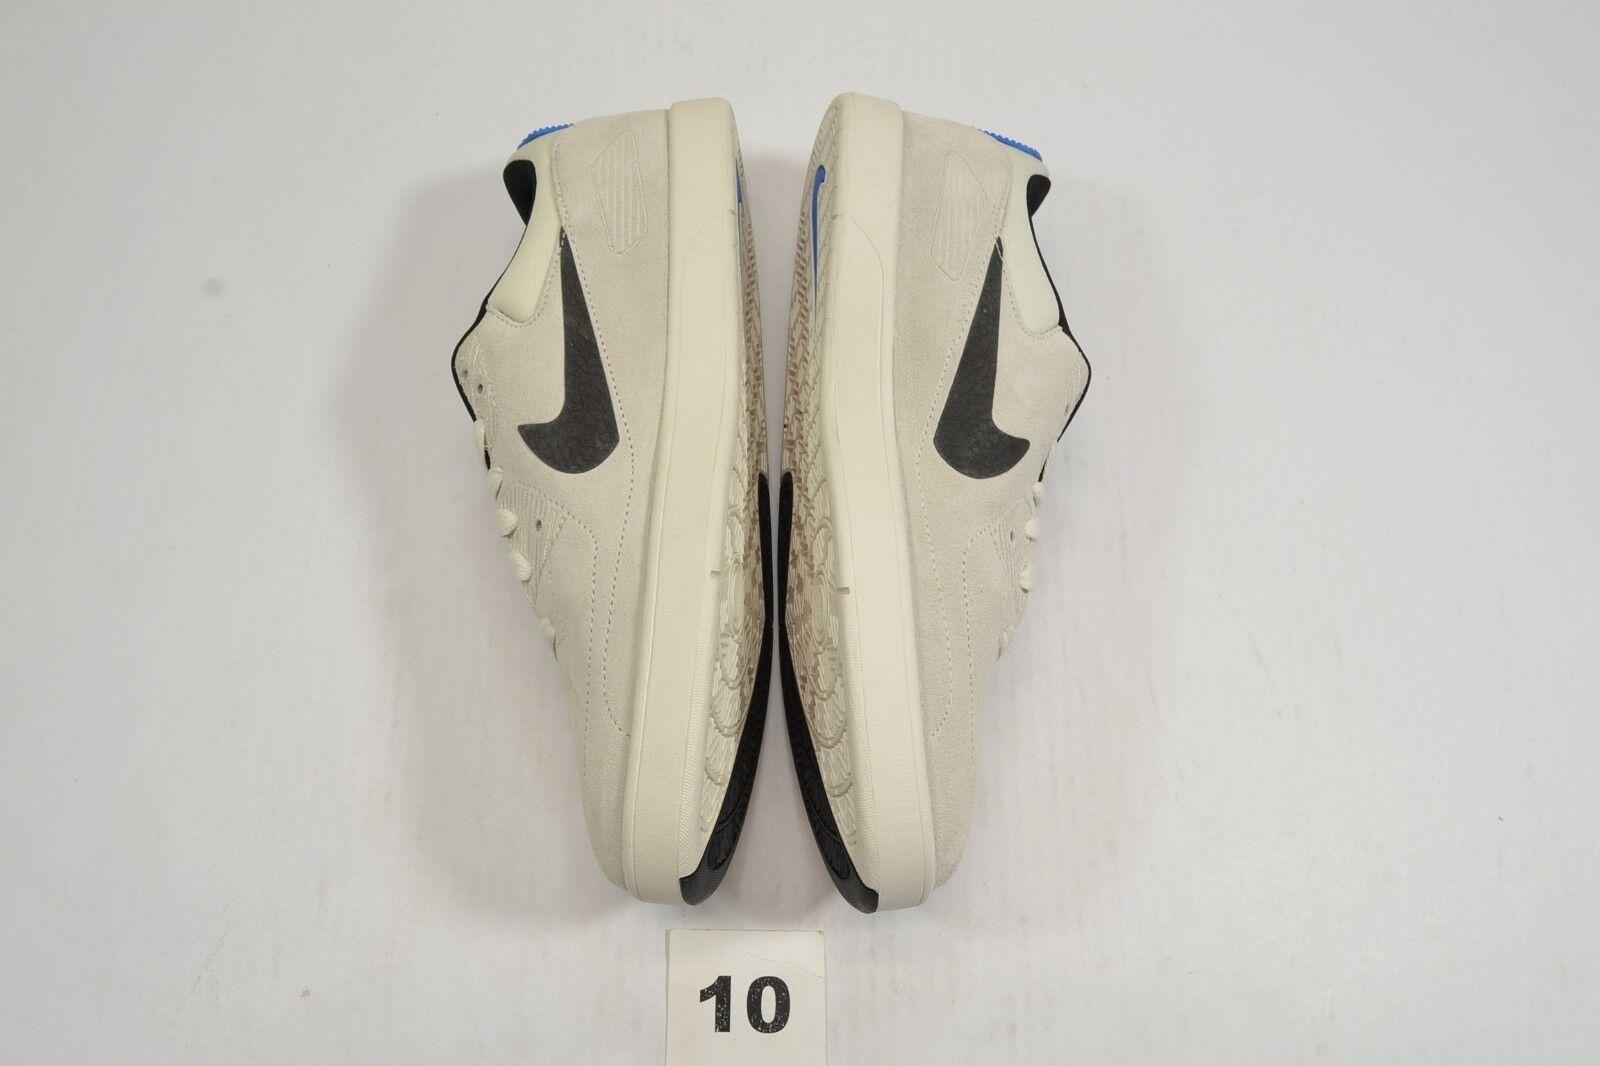 Nike koston x vela nera nera nera foto blu) patrimonio skate (238), scarpe da uomo | Materiale preferito  b285ae